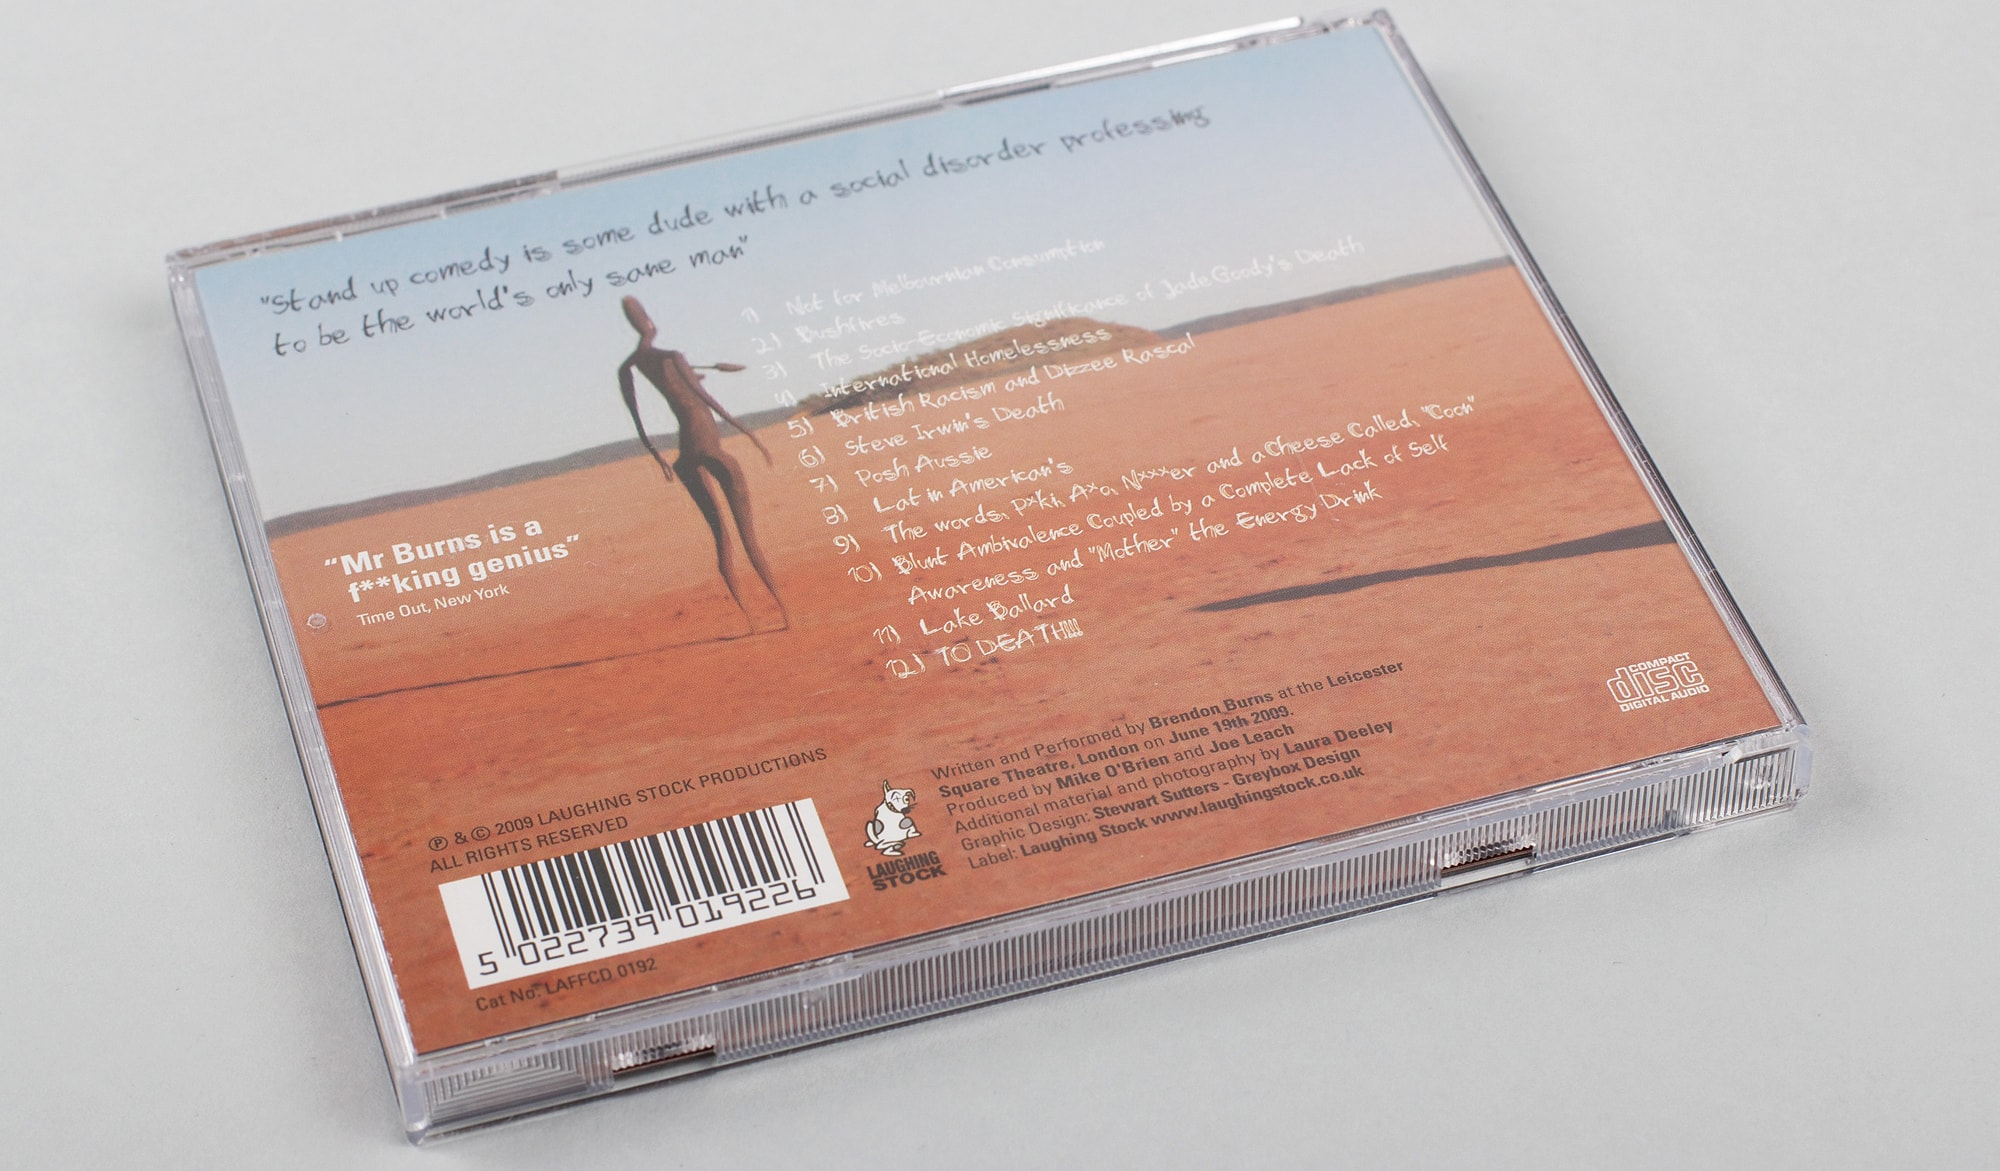 Brendon Burns CD  - packaging